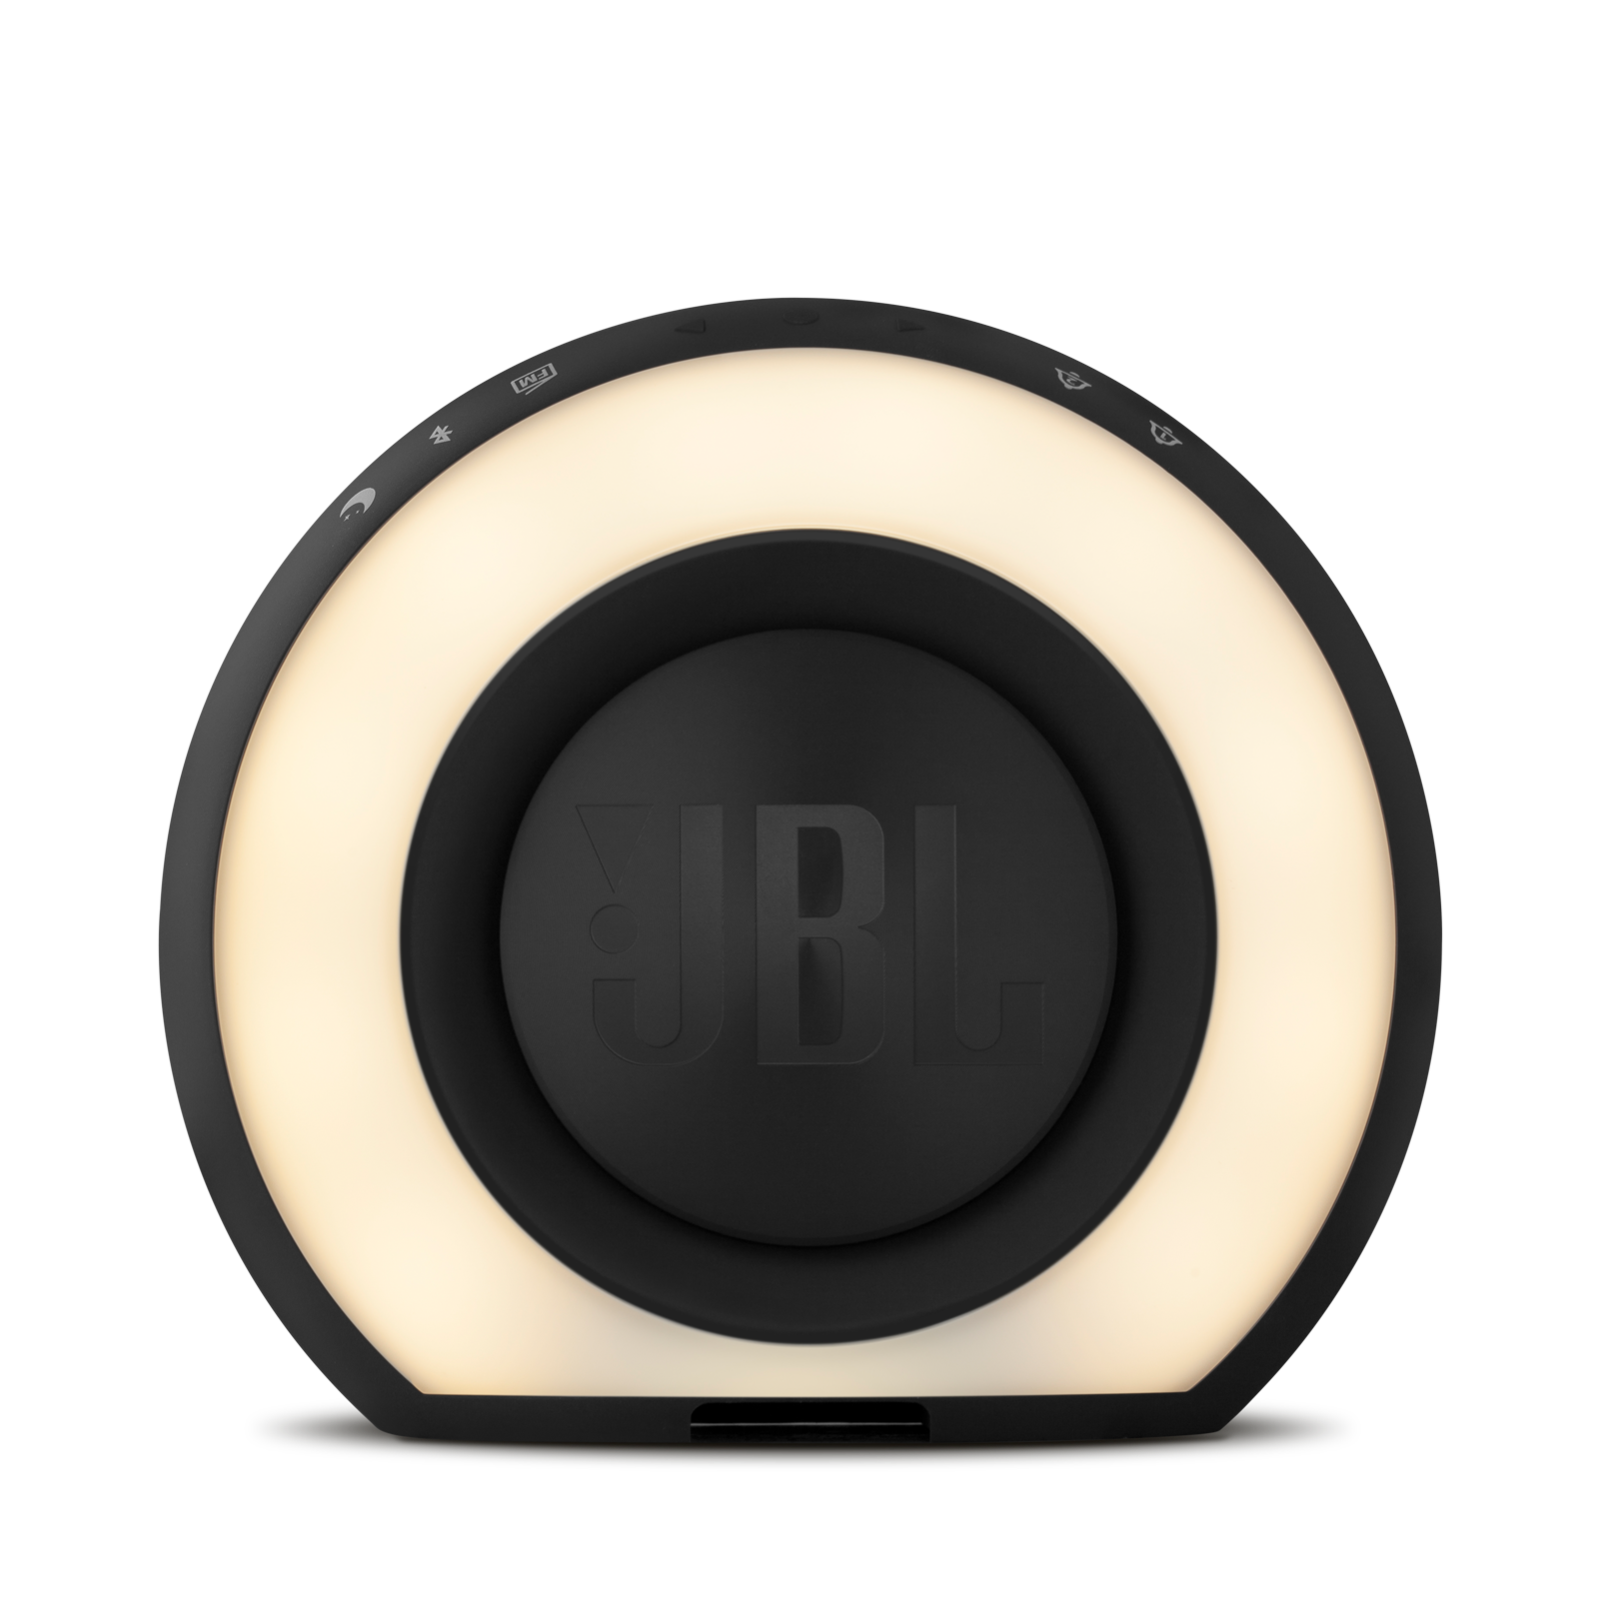 jbl horizon bluetooth radiowecker mit usb ladeanschluss. Black Bedroom Furniture Sets. Home Design Ideas